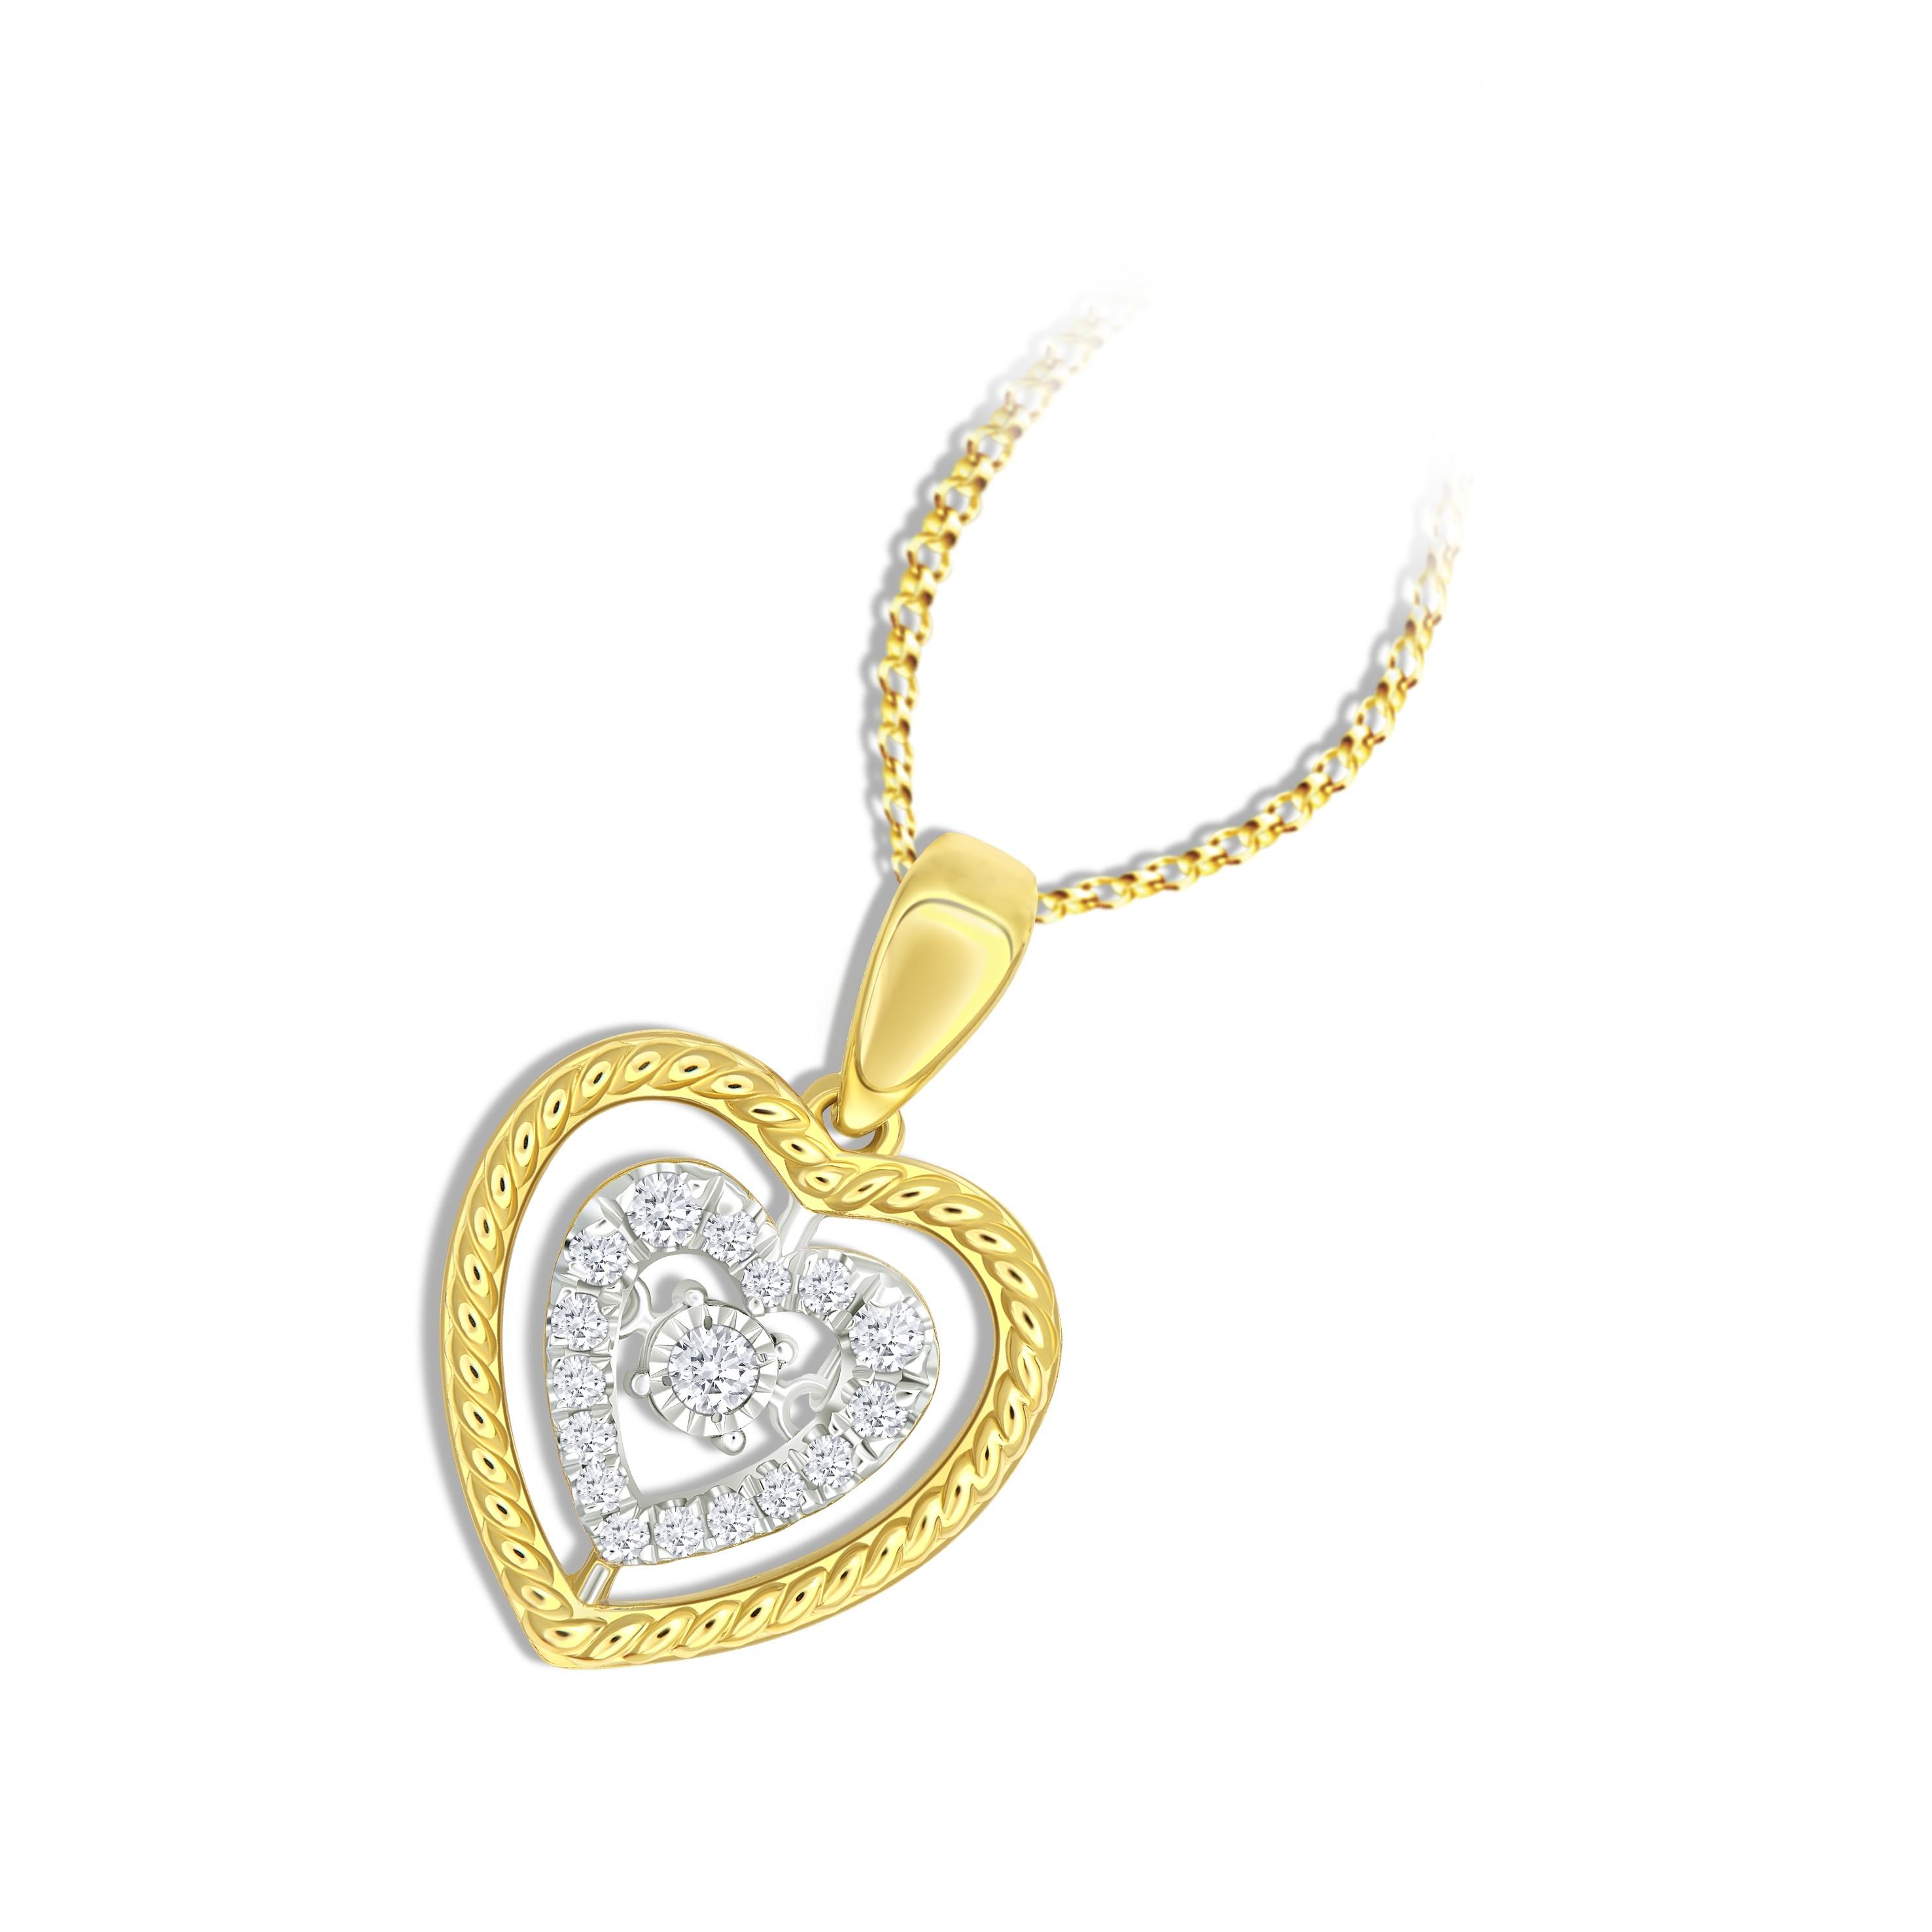 18K YELLOW GOLD HEART BEATS PENDANT KNG25P